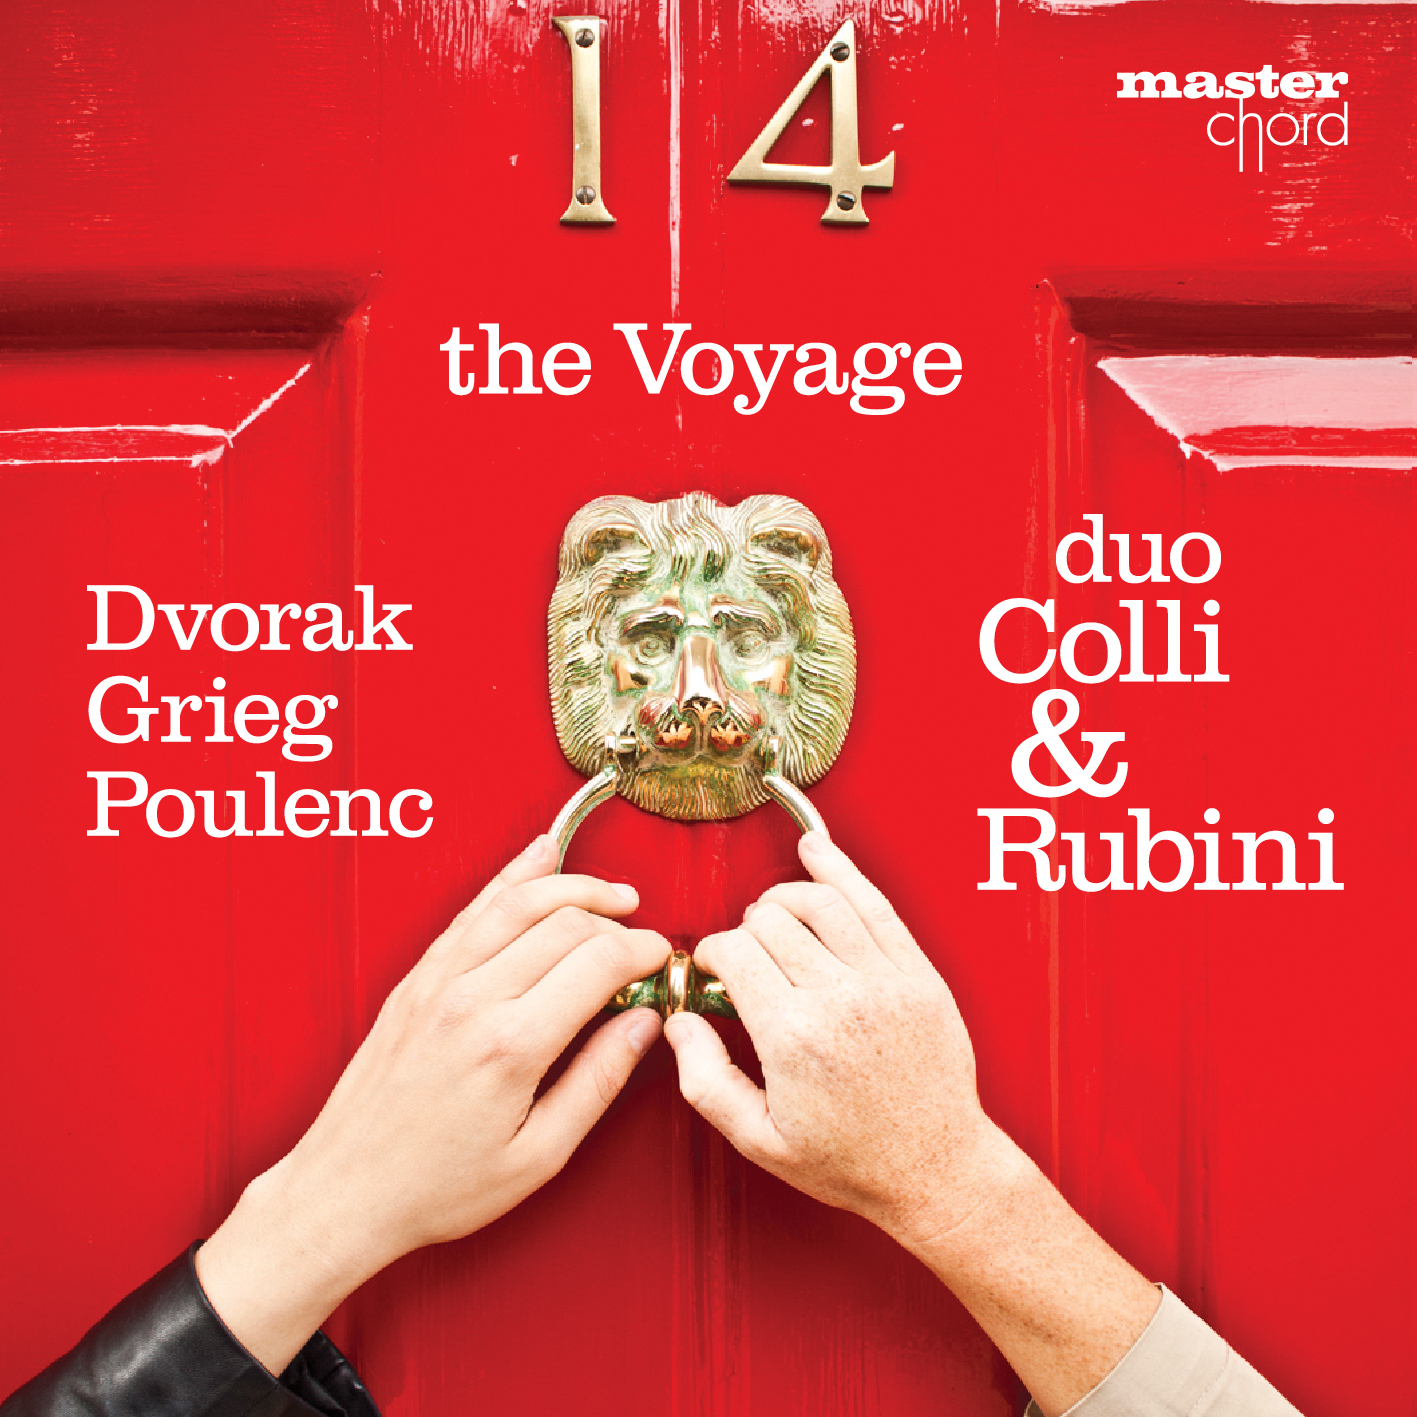 The Voyage: Dvorak, Grieg, Poulenc